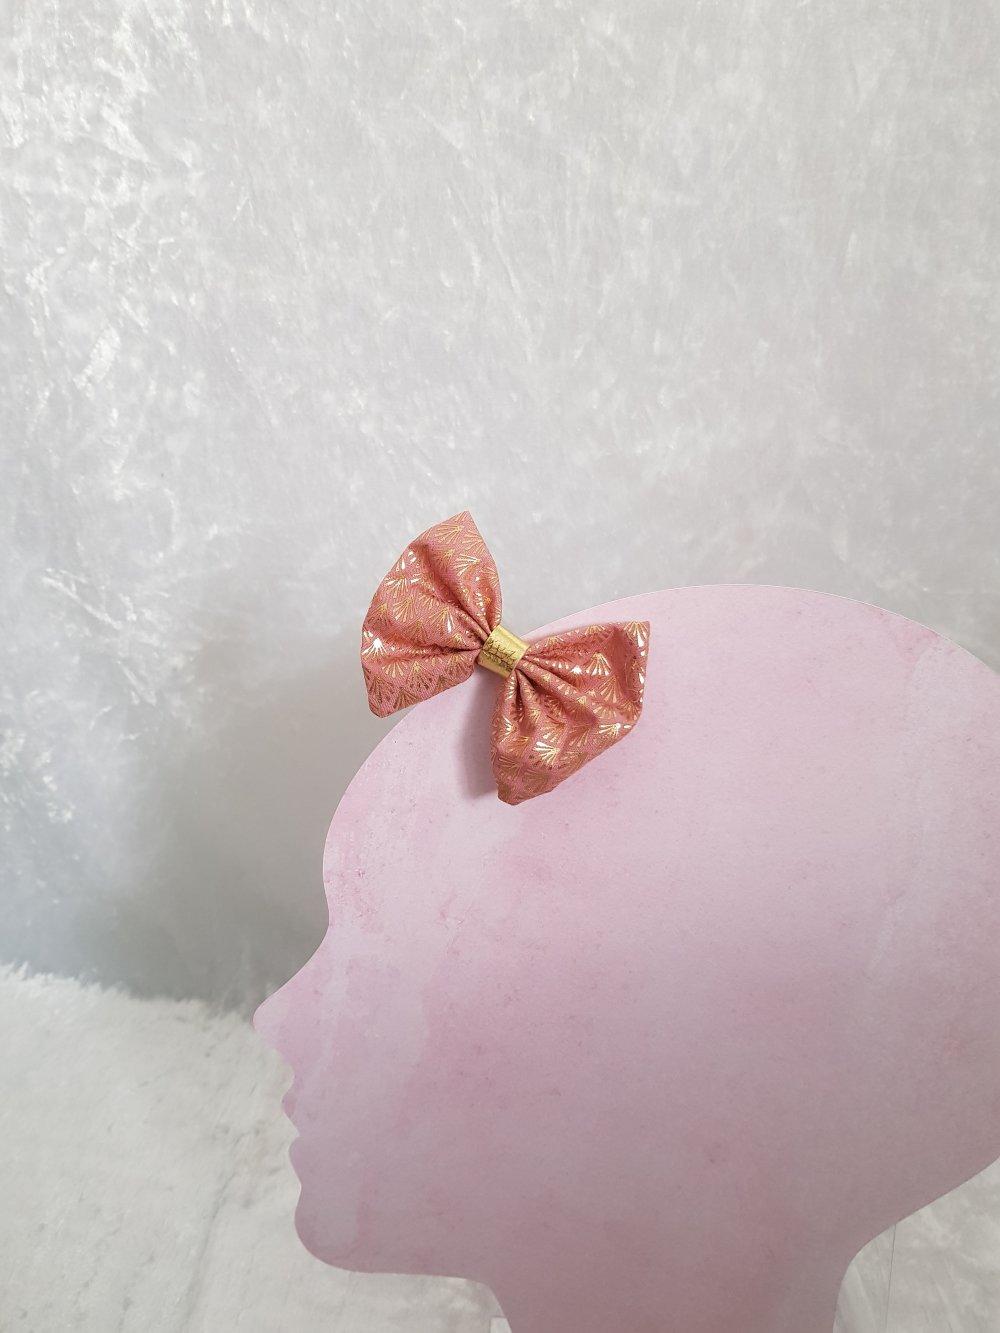 Pince noeud à chéveux en tissu